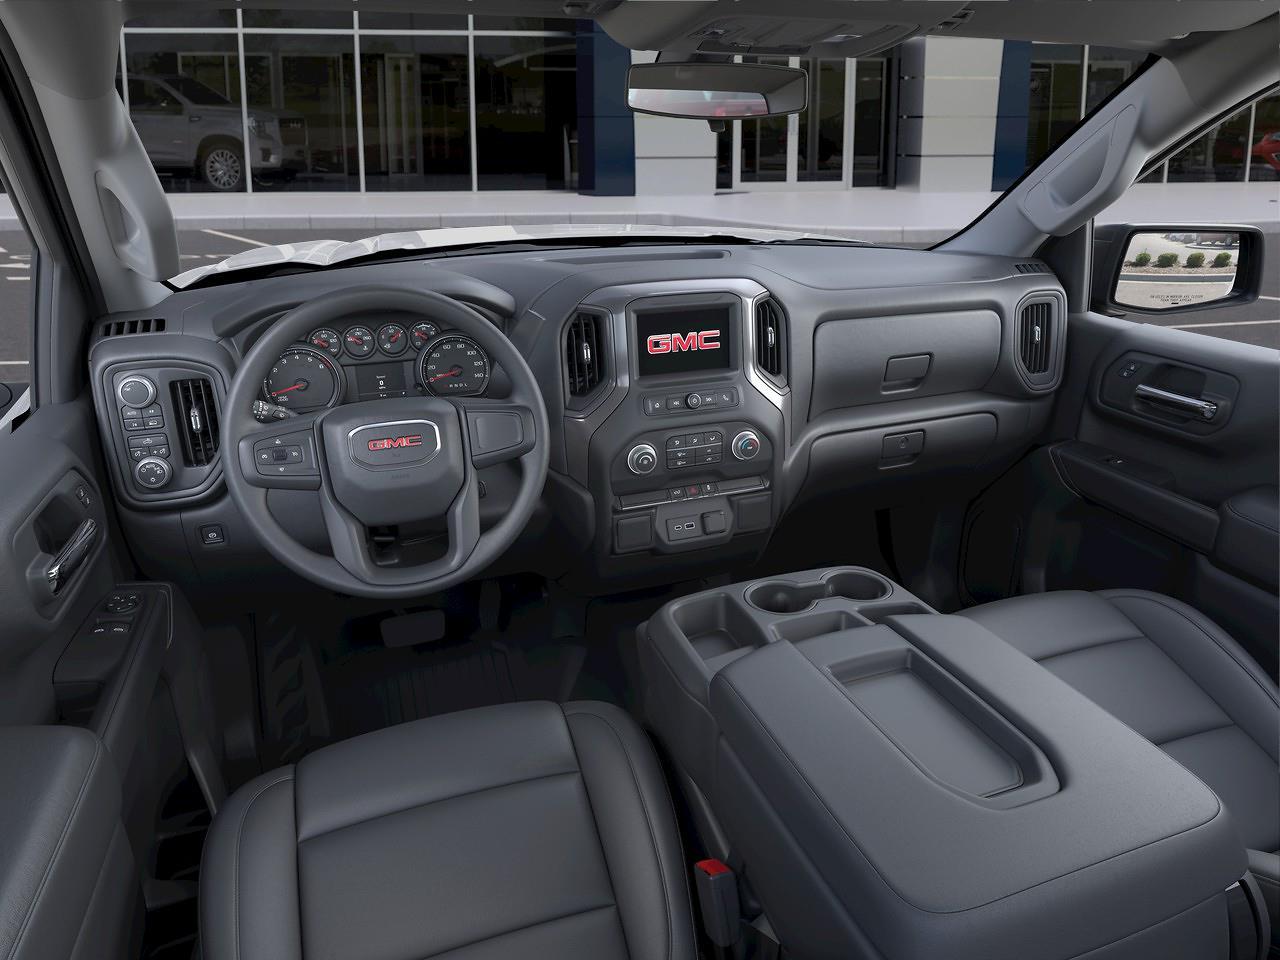 2021 GMC Sierra 1500 Regular Cab 4x4, Pickup #2A40568 - photo 12